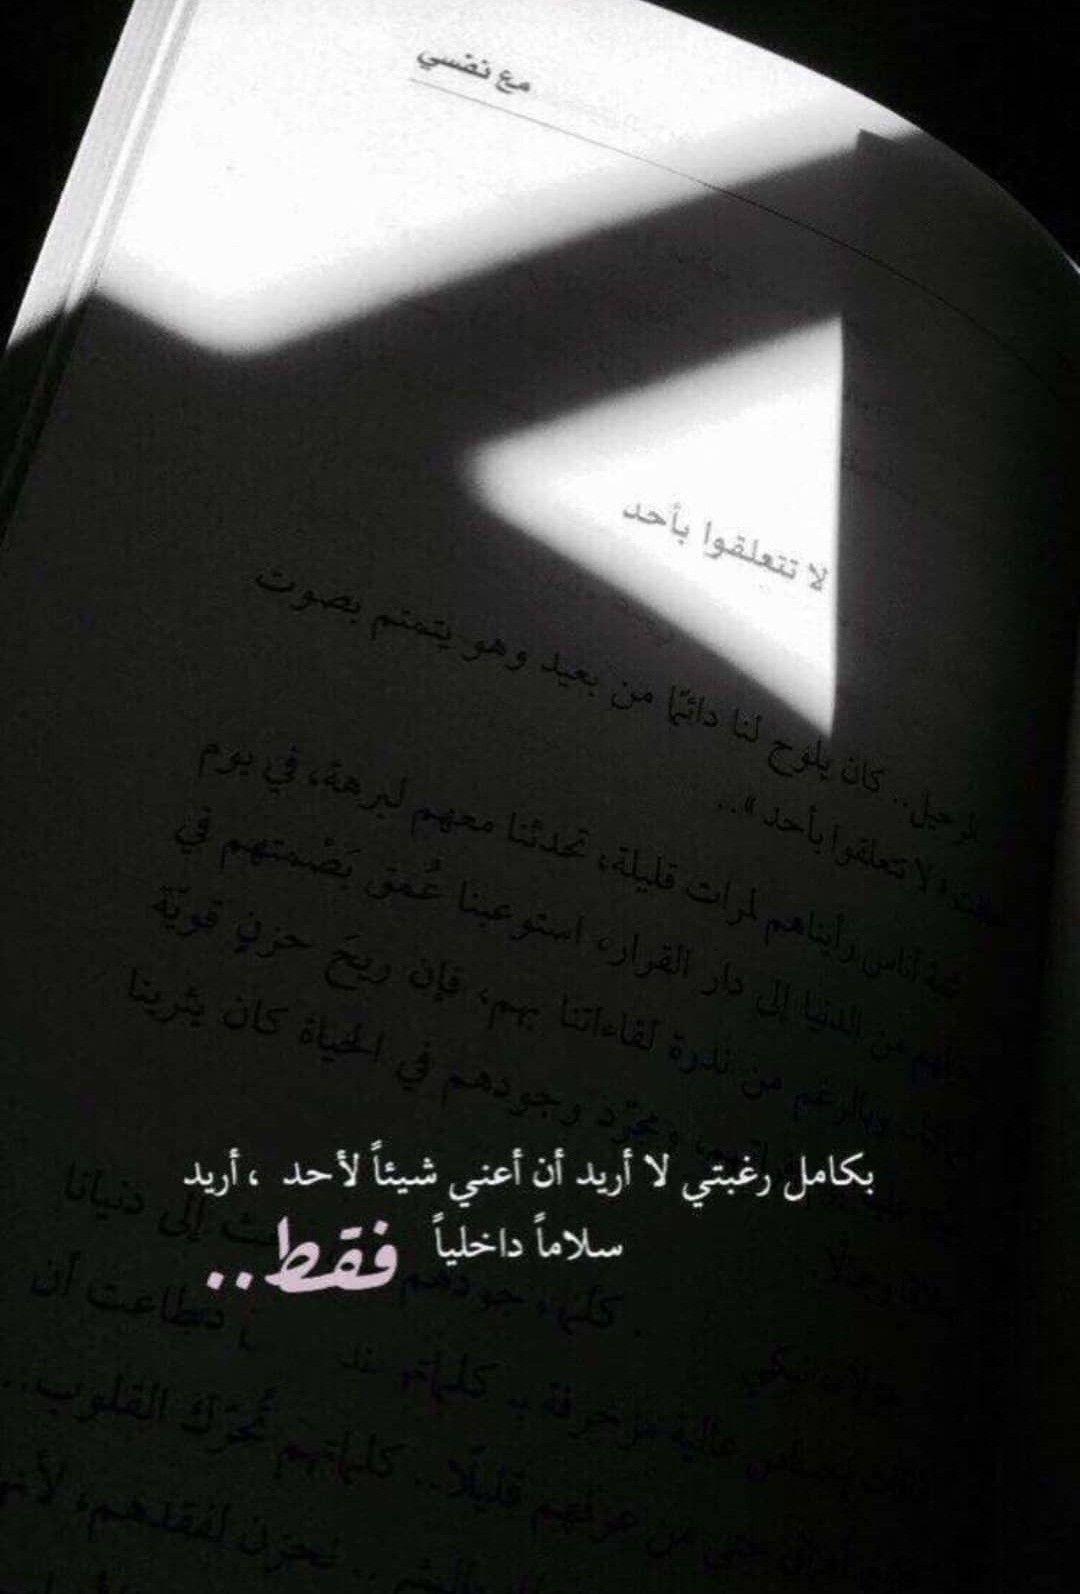 محمد نصر Words Quotes Inspirational Words Quotations